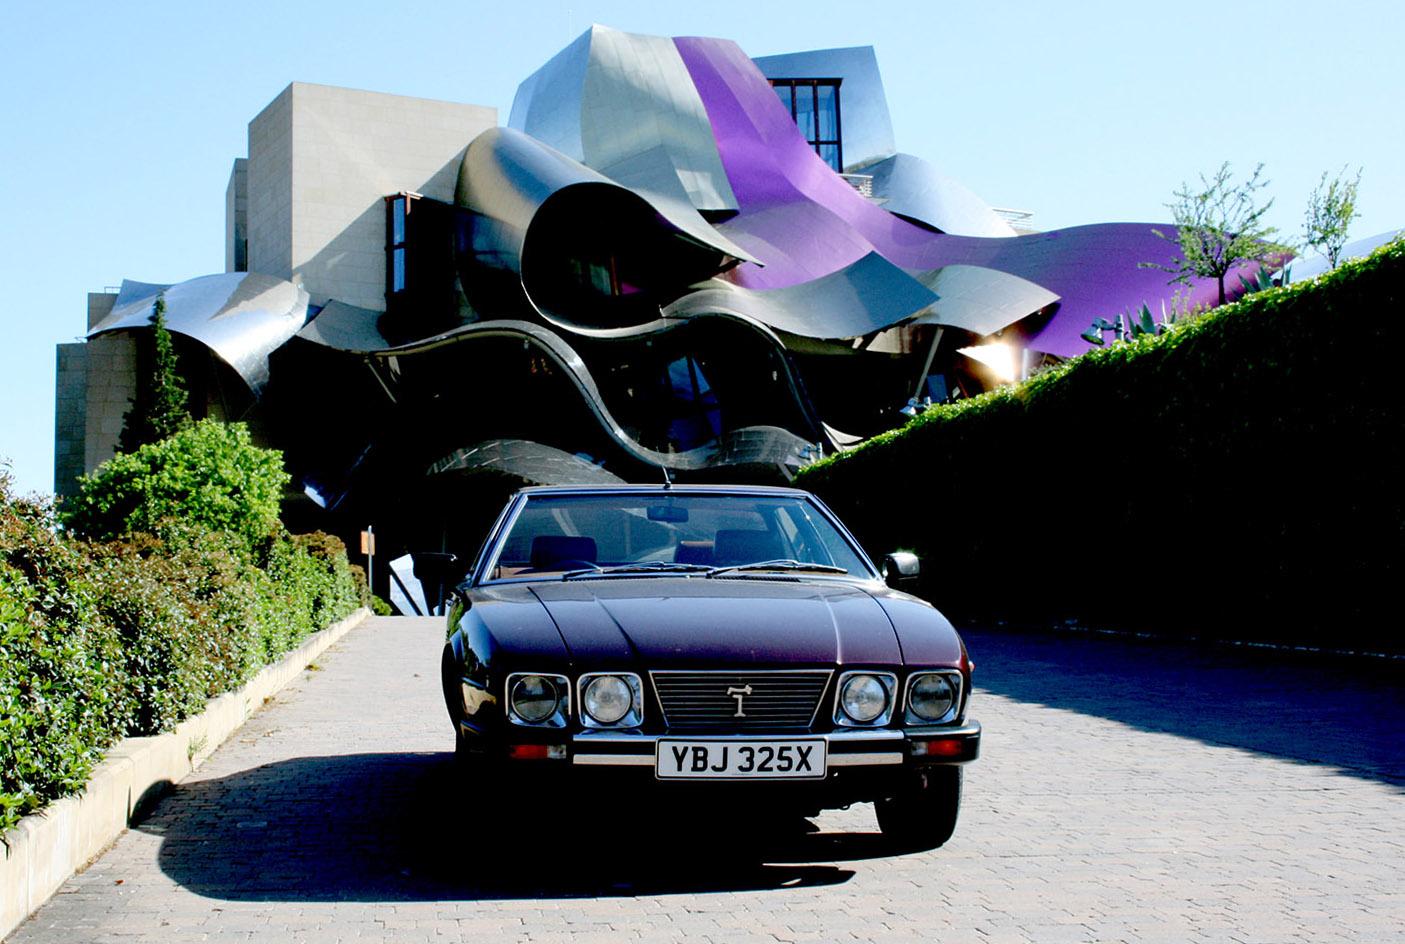 1982 De Tomaso Deauville Series 2, fully restored.